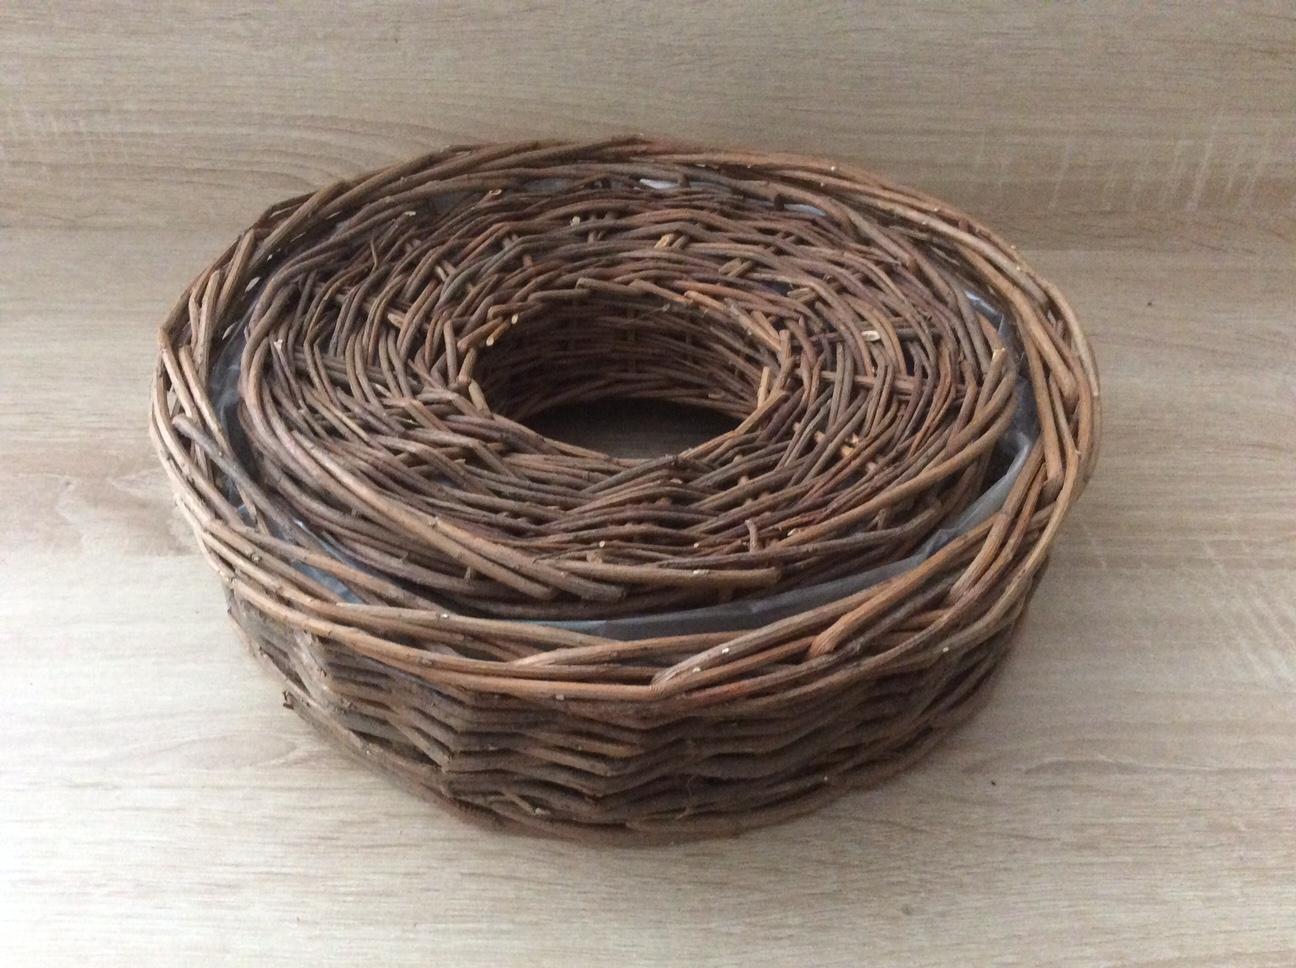 Holz Pflanz-Ringe 2er Set Pflanzring Pflanzkorb Pflanzenkorb